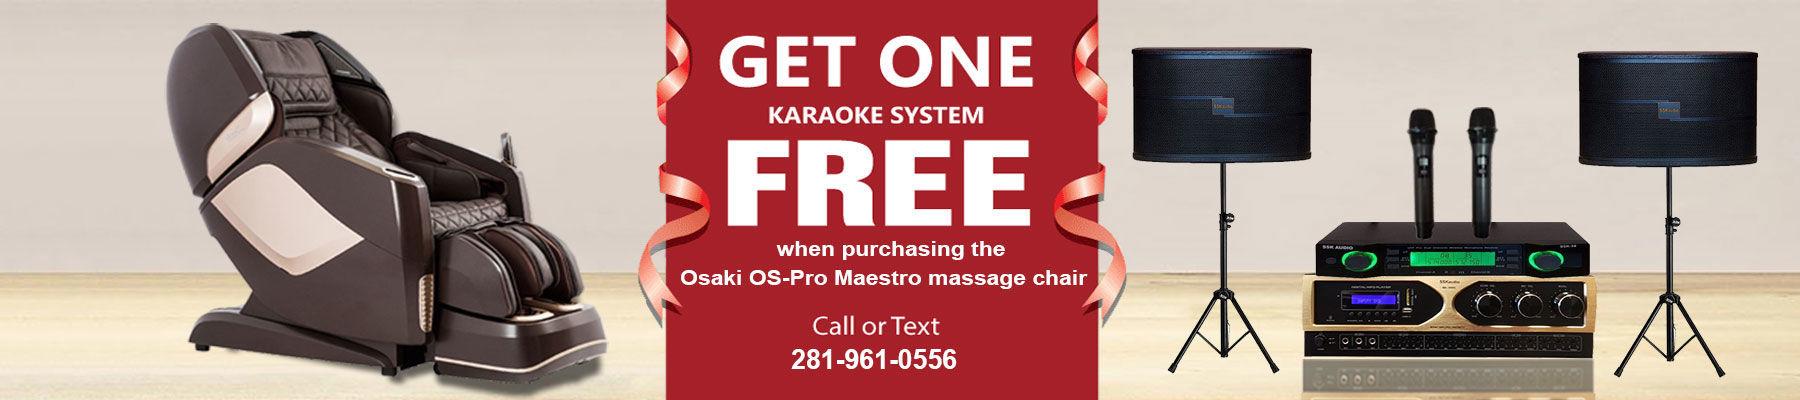 Free karaoke system when purchase the Osaki Maestro massage chair